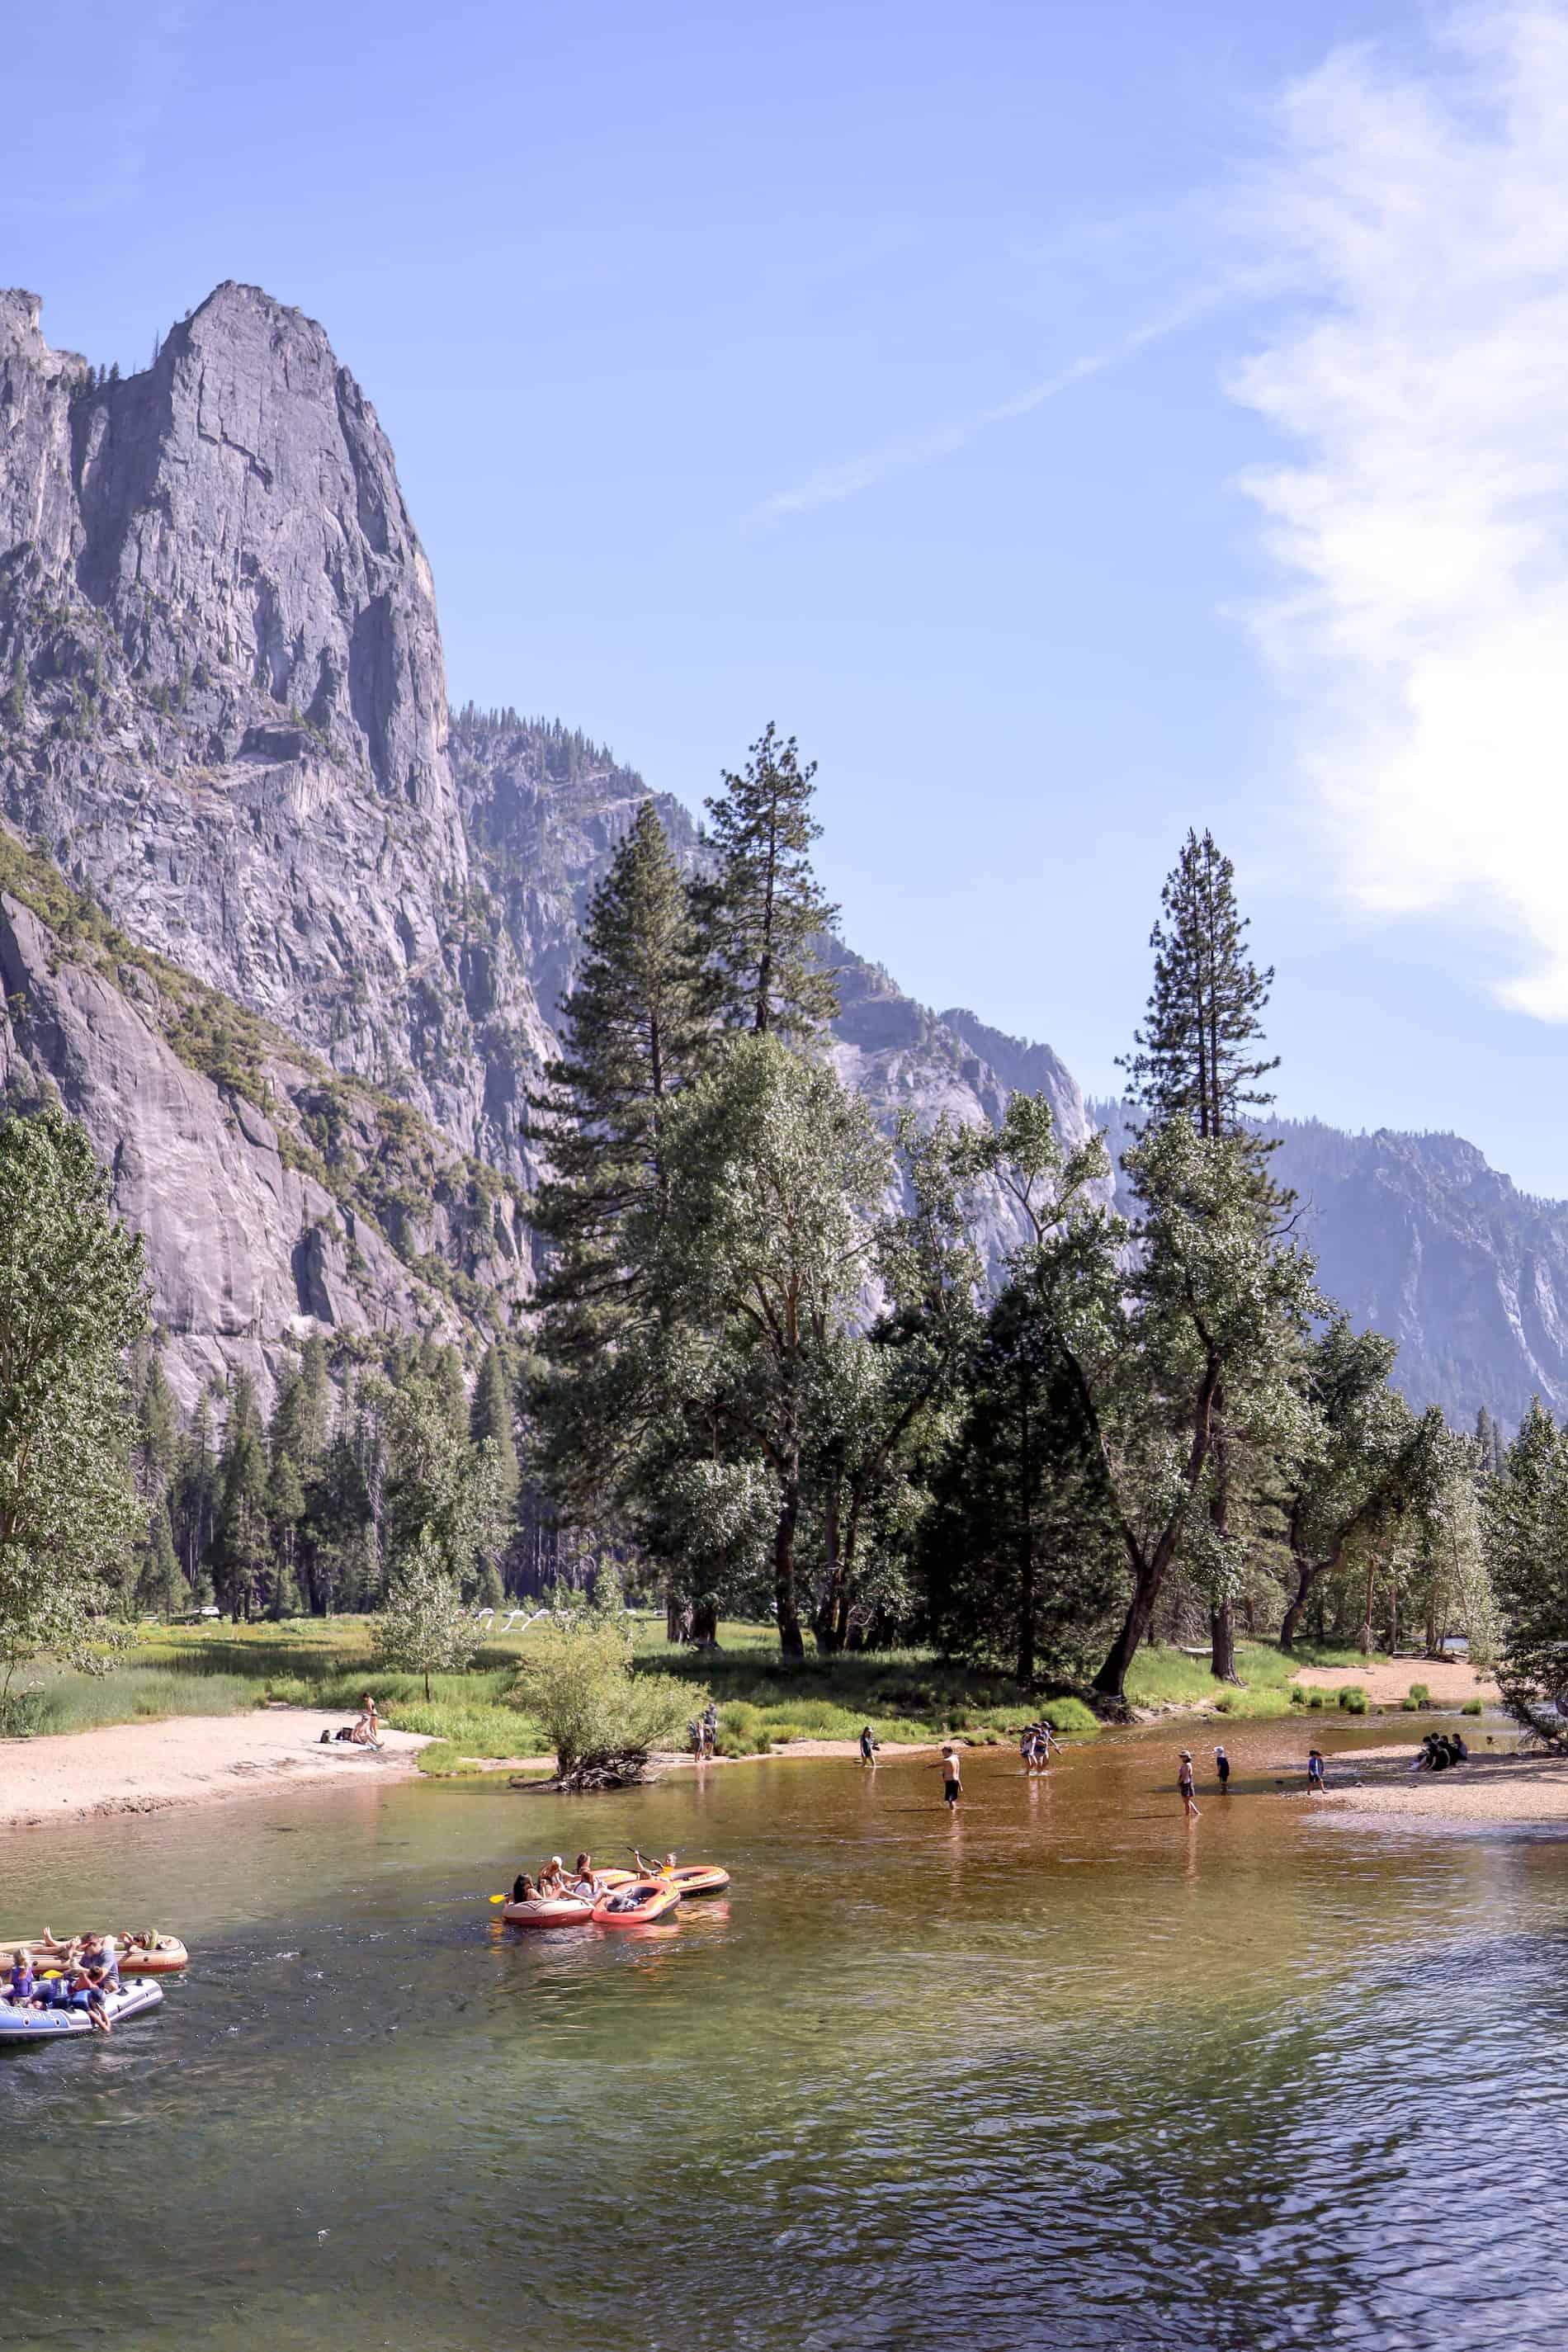 Yosemite Valley Yosemite National Park